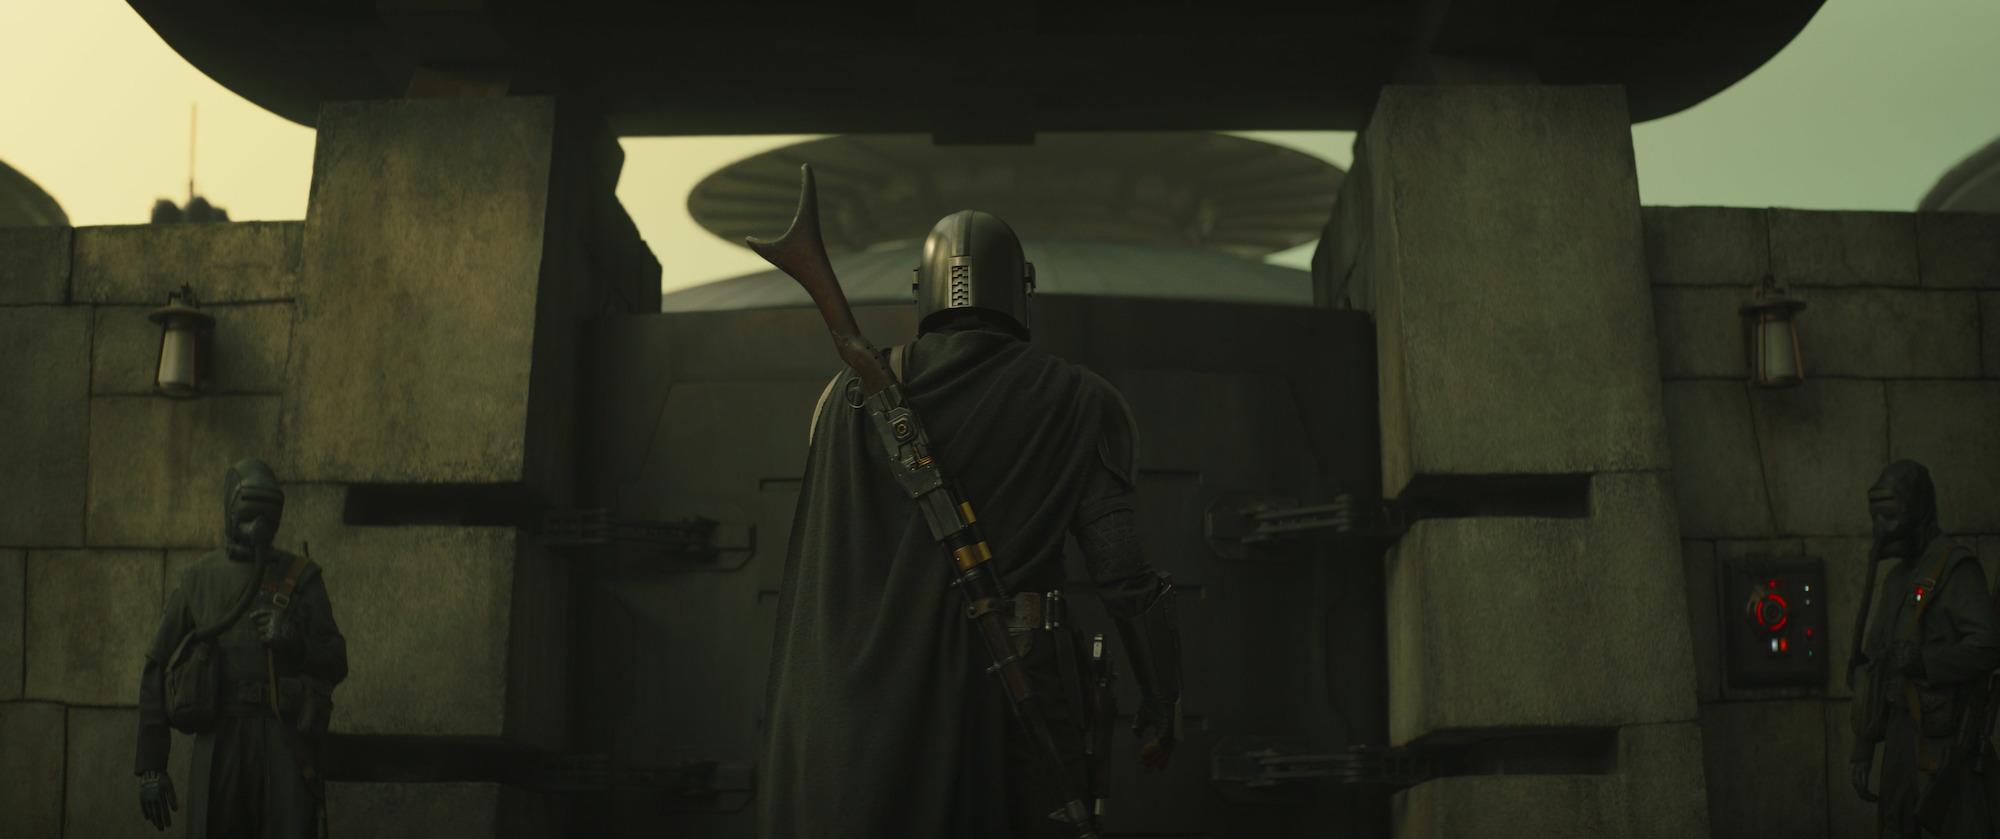 "Mando on Corvus in 'The Mandalorian' ""Chapter 13: The Jedi"""